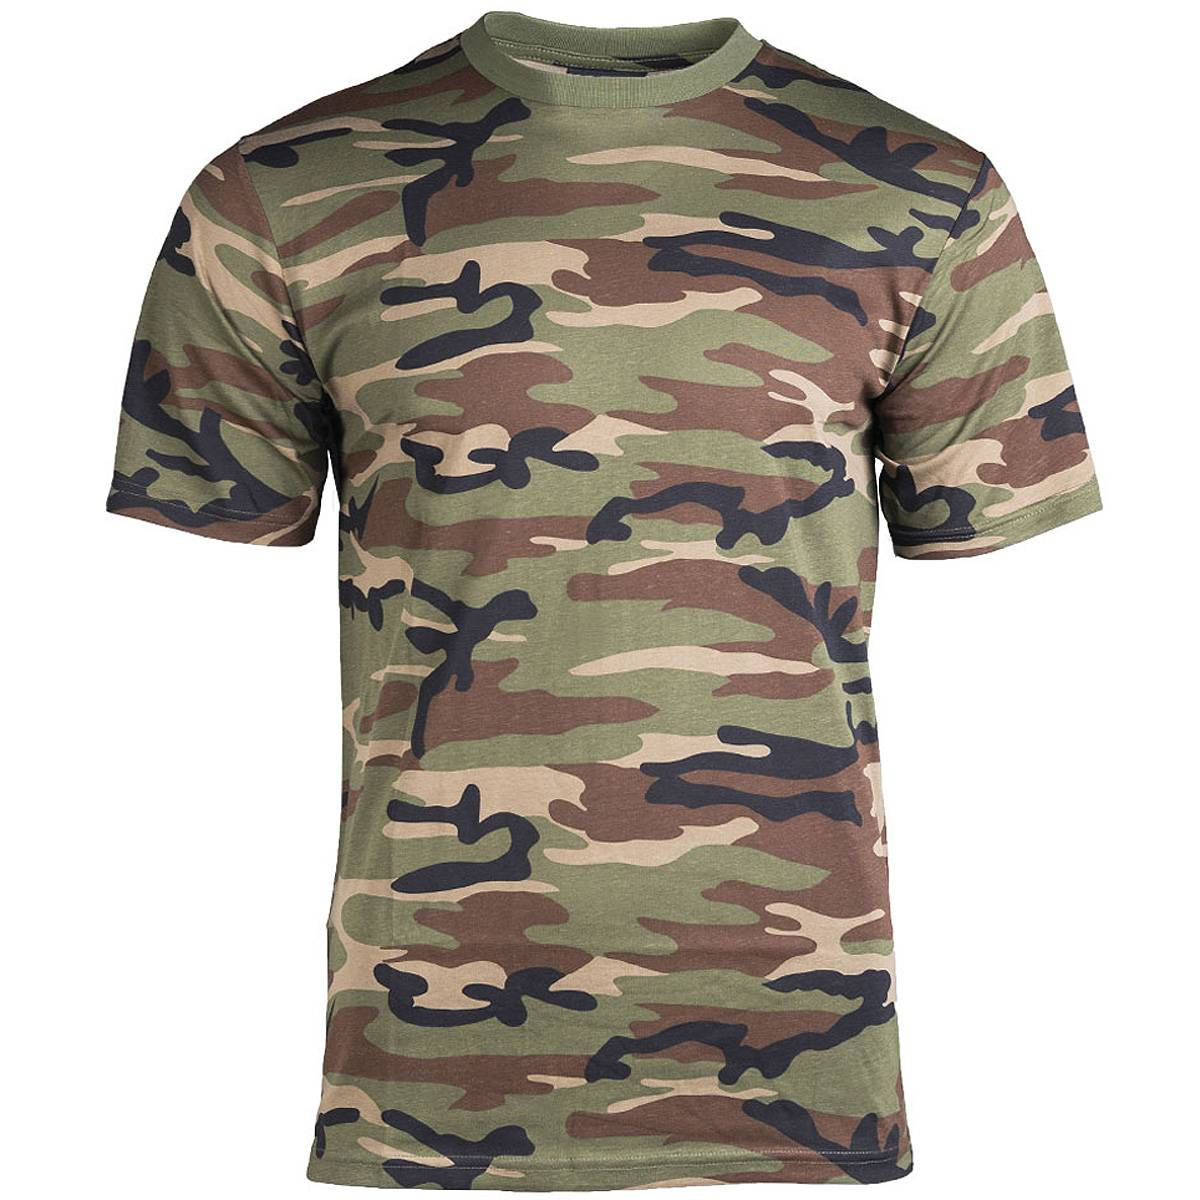 tarn t shirt woodland xxl der gro e bundeswehr shop army shop na 8 90. Black Bedroom Furniture Sets. Home Design Ideas